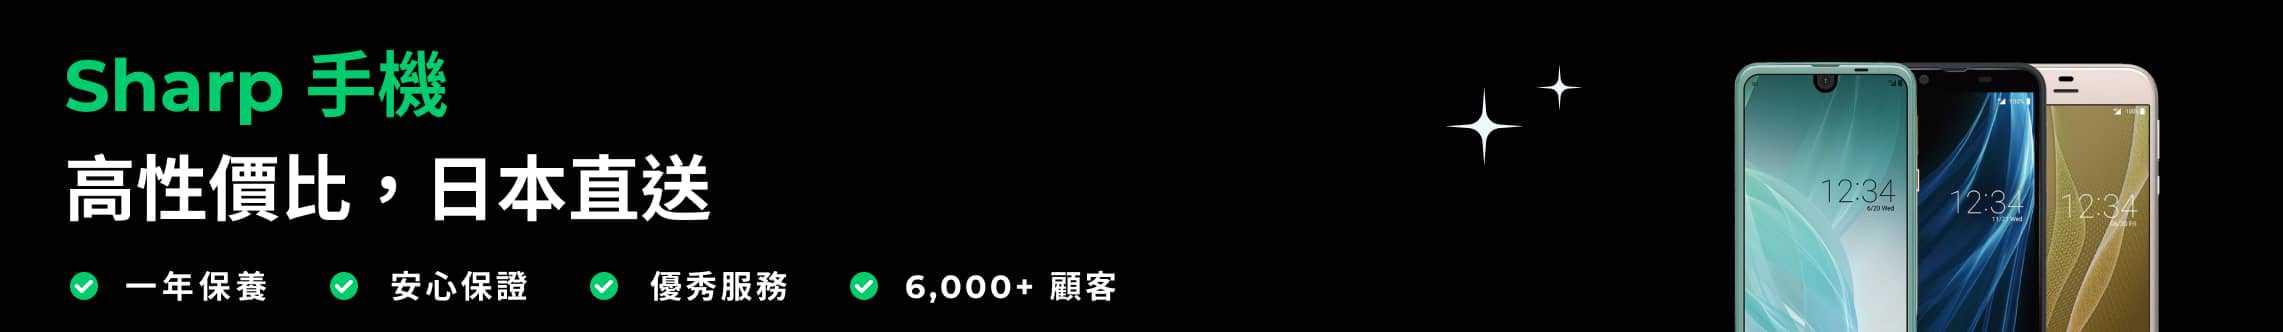 Sharp 手機 日本直送